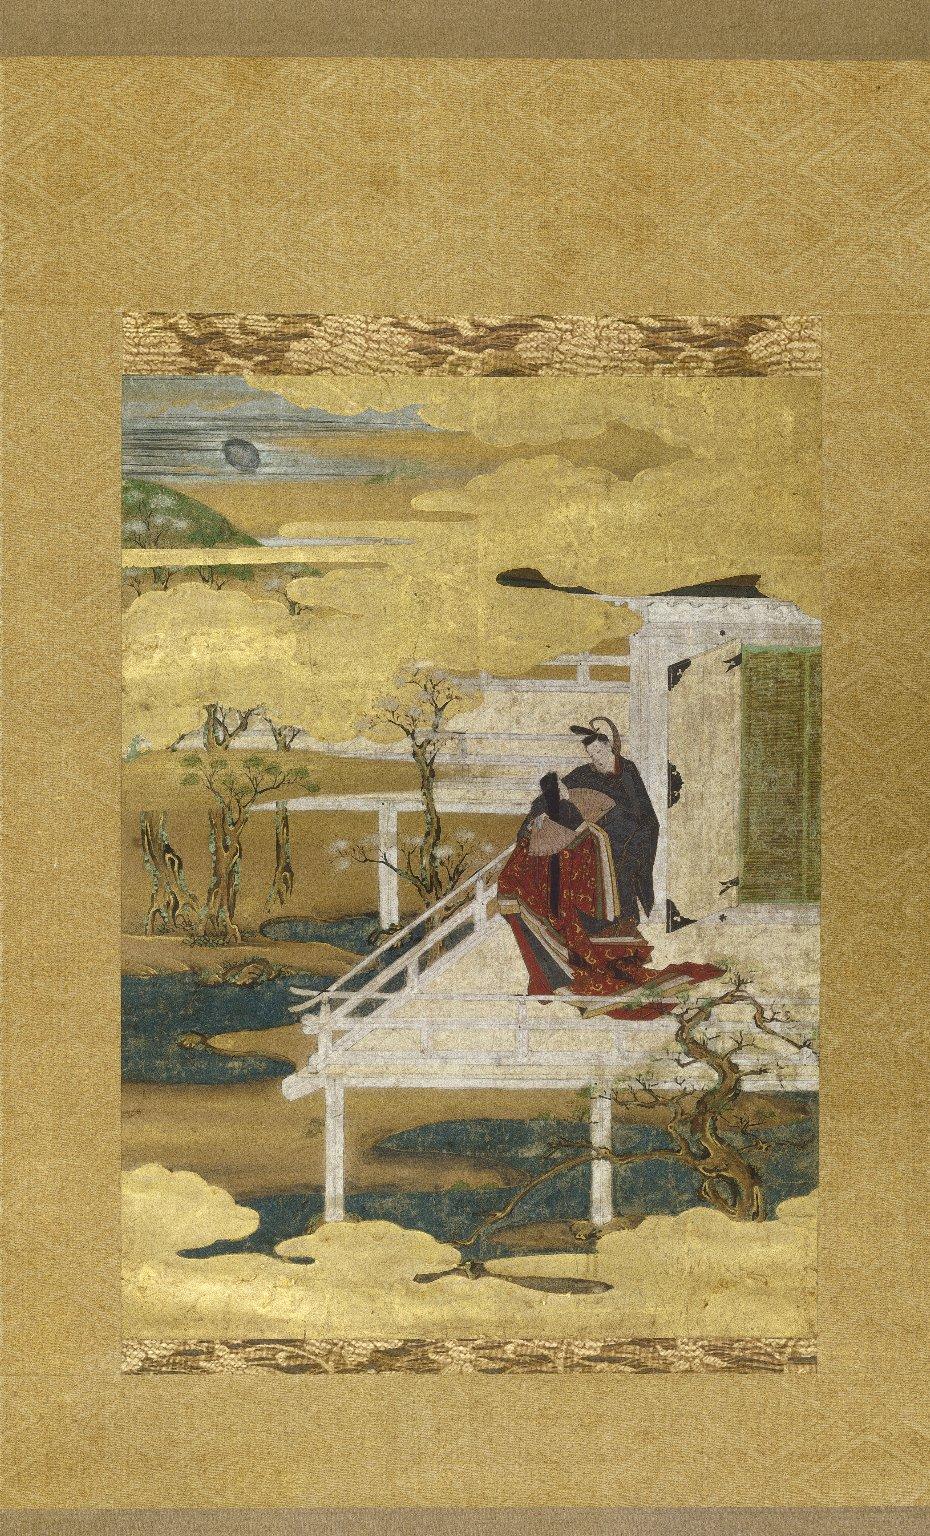 Scene from Tale of Genji